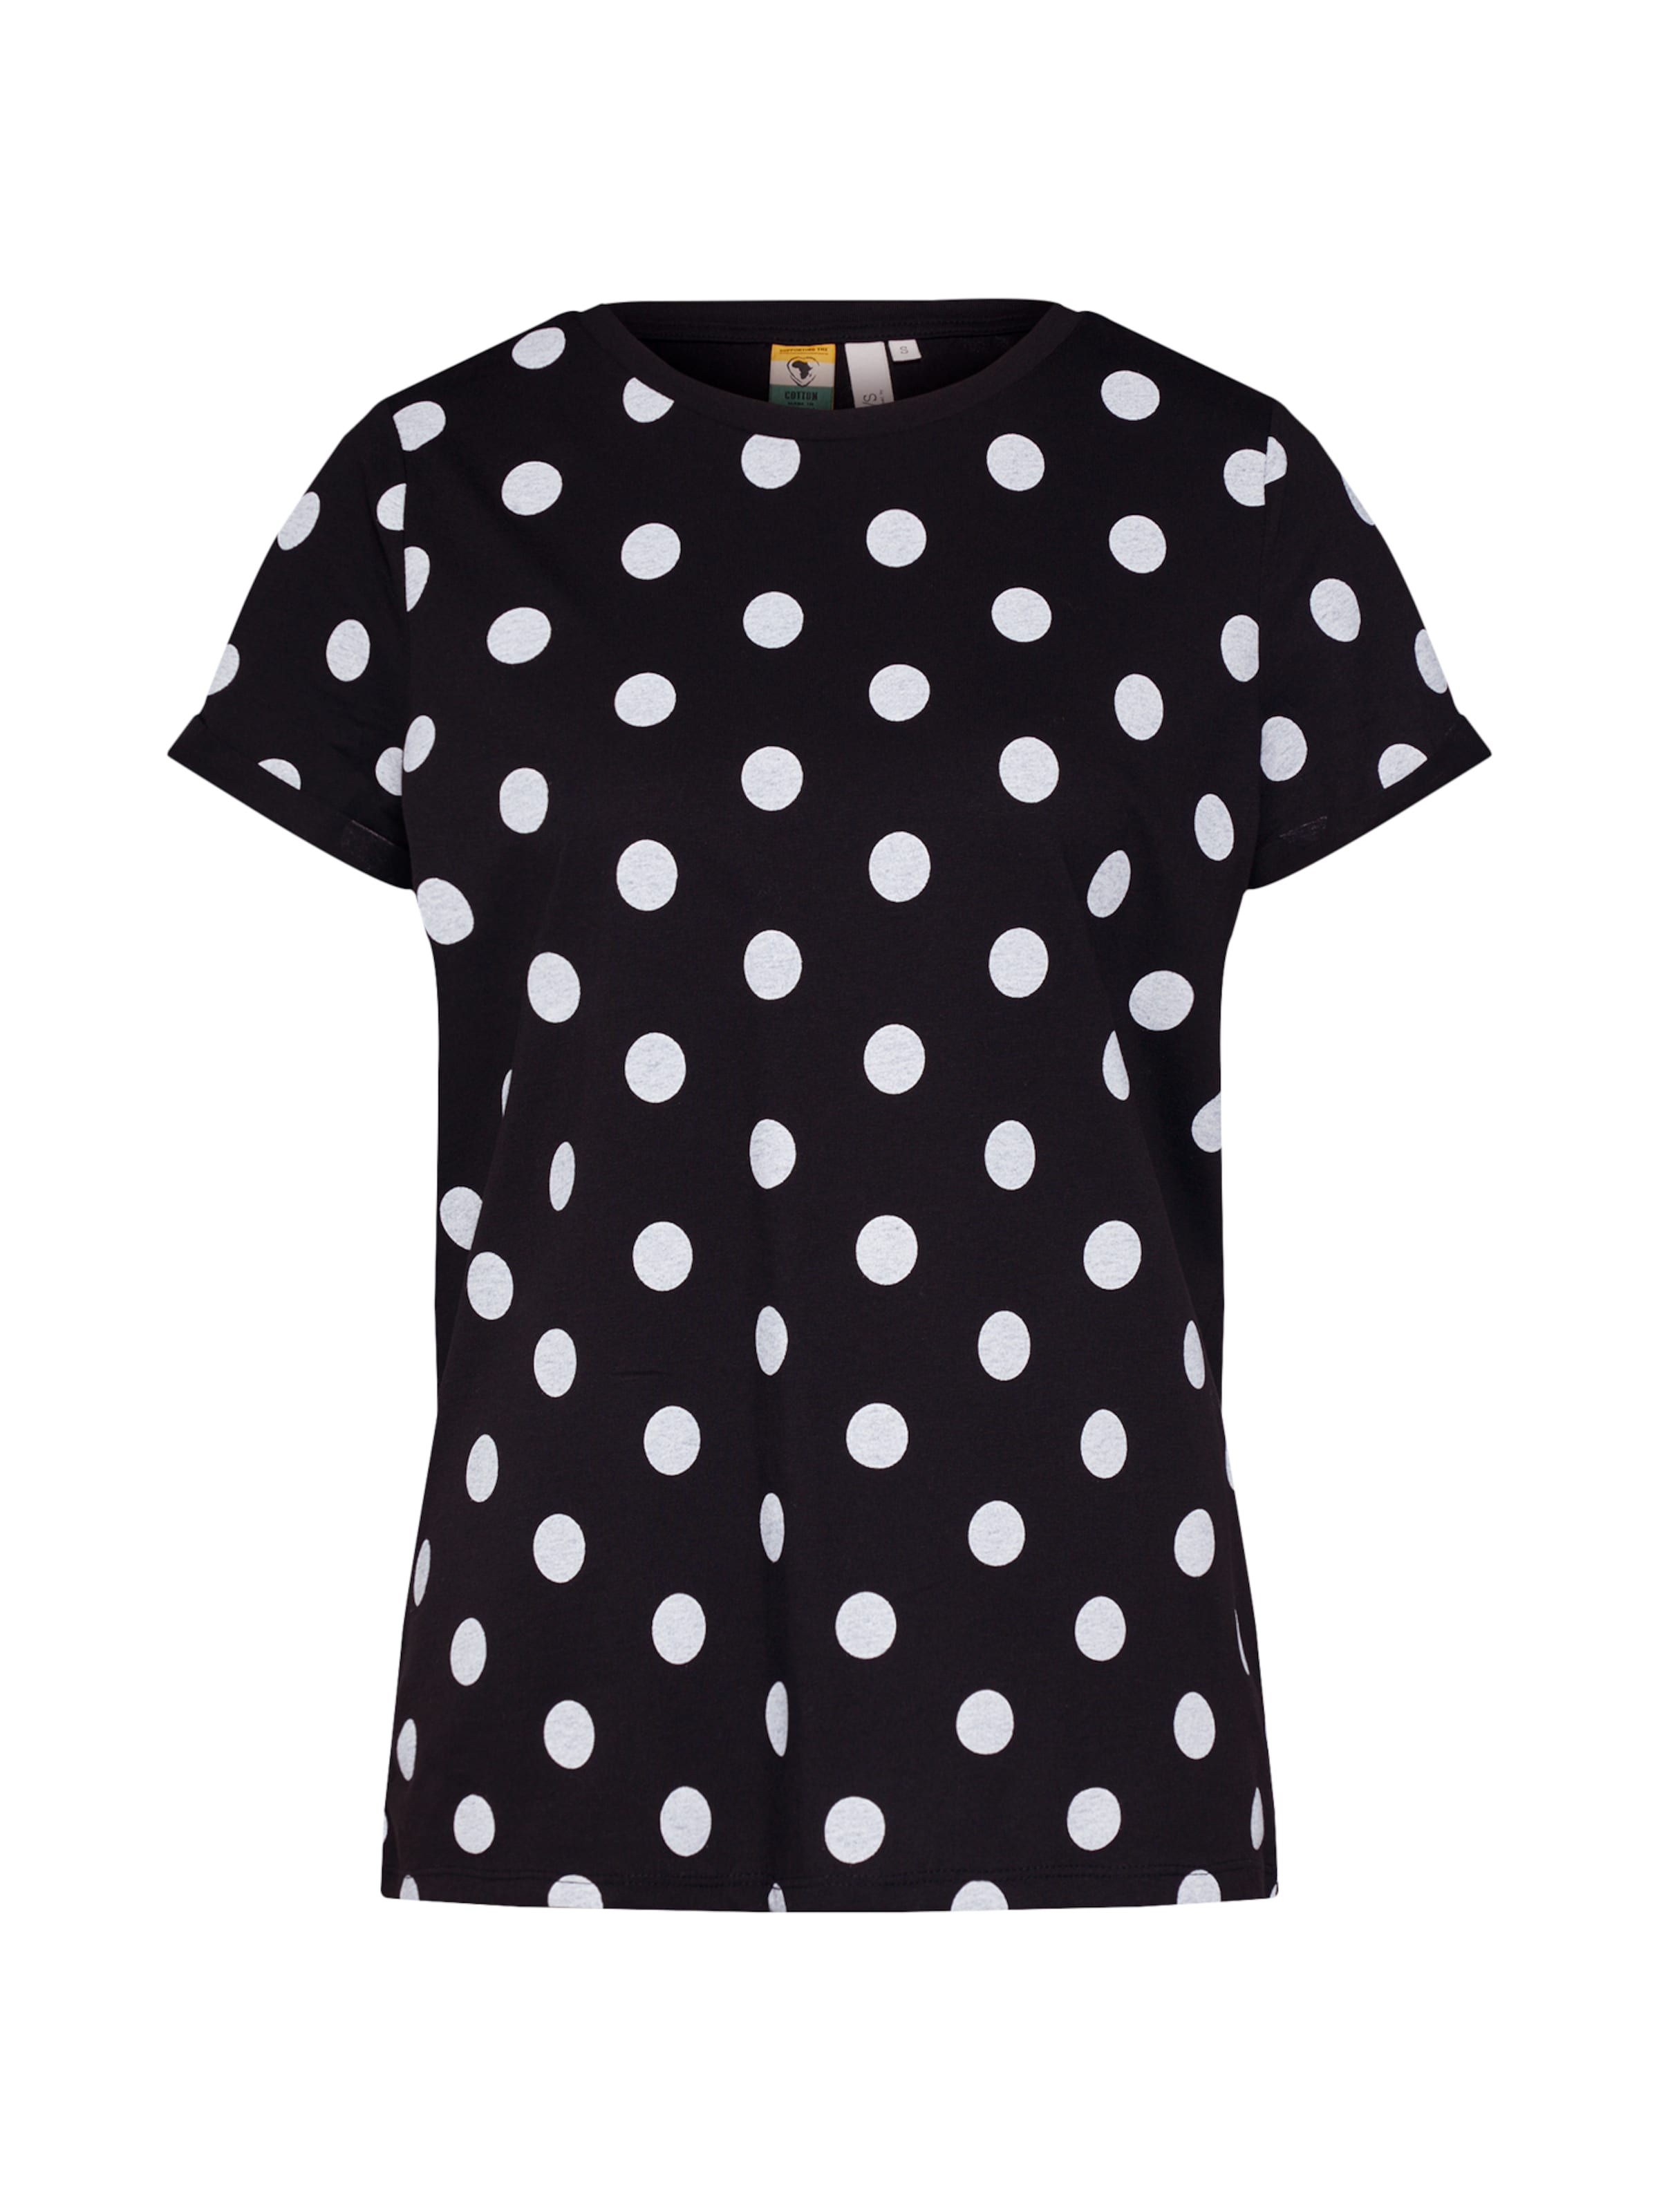 Q Designed Schwarz Shirt In By s Lq4j5R3A